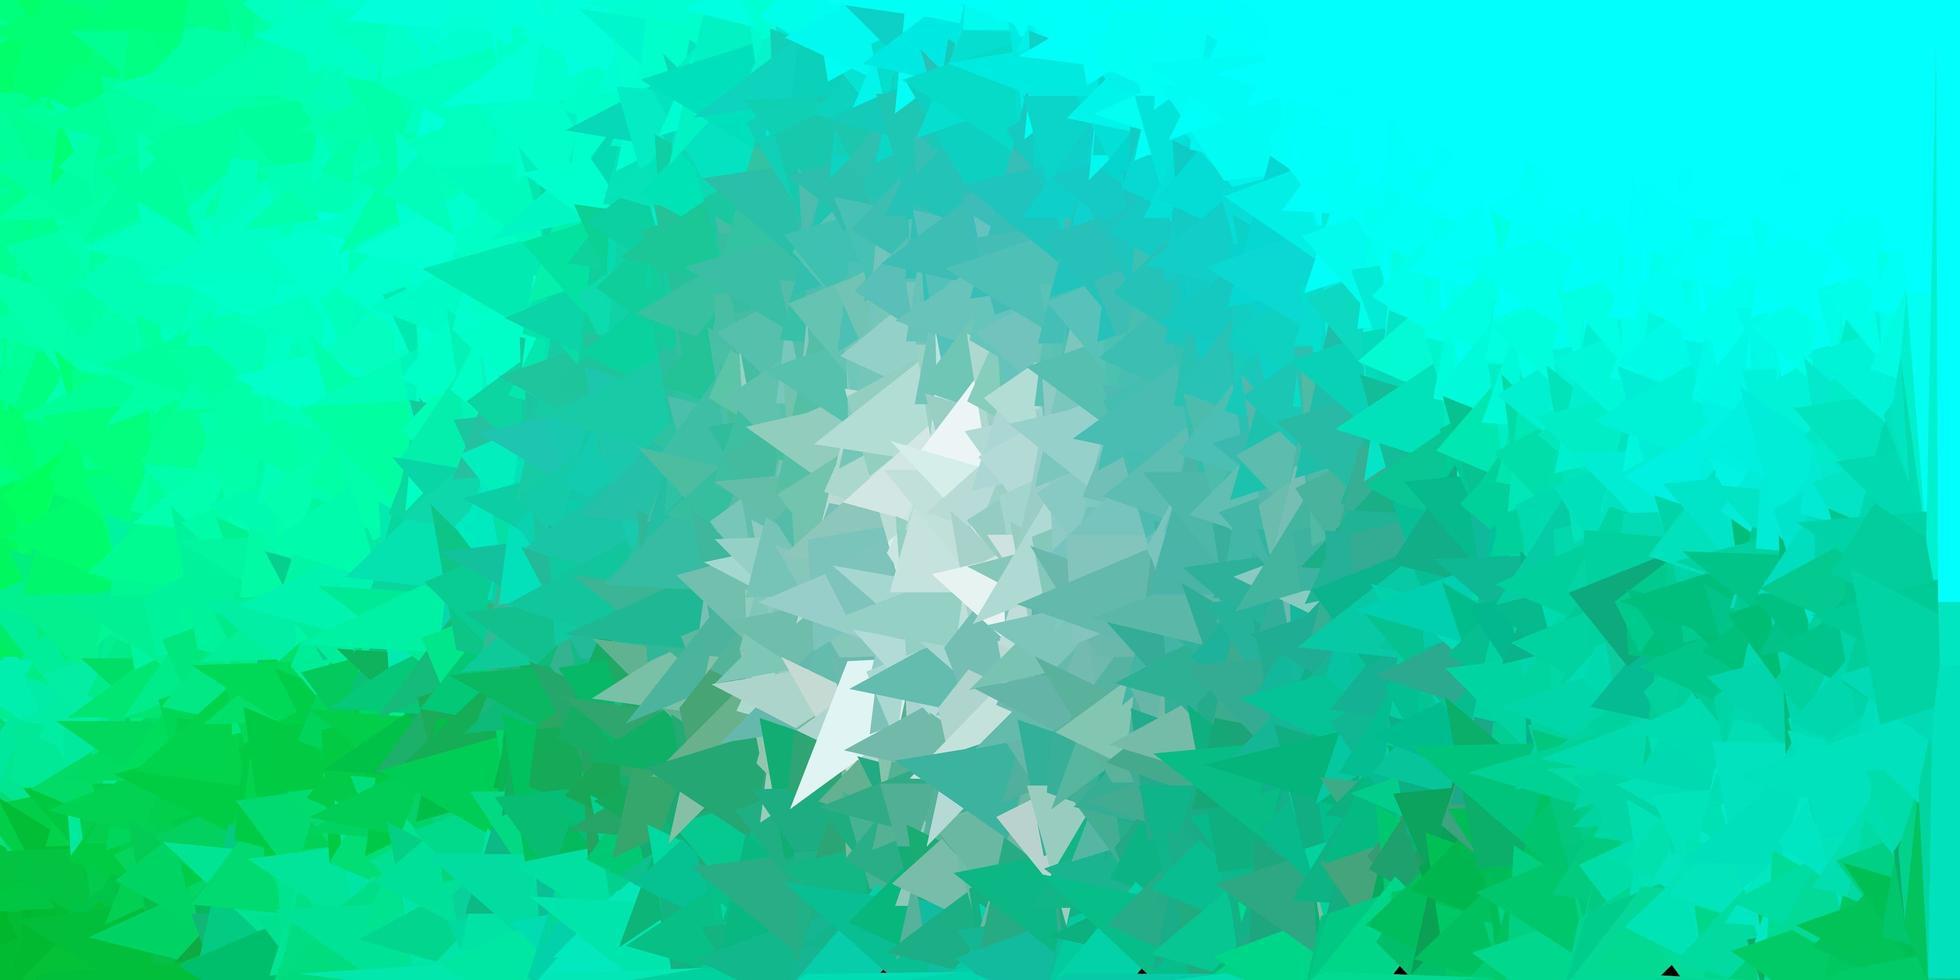 fond polygonale vecteur vert clair.